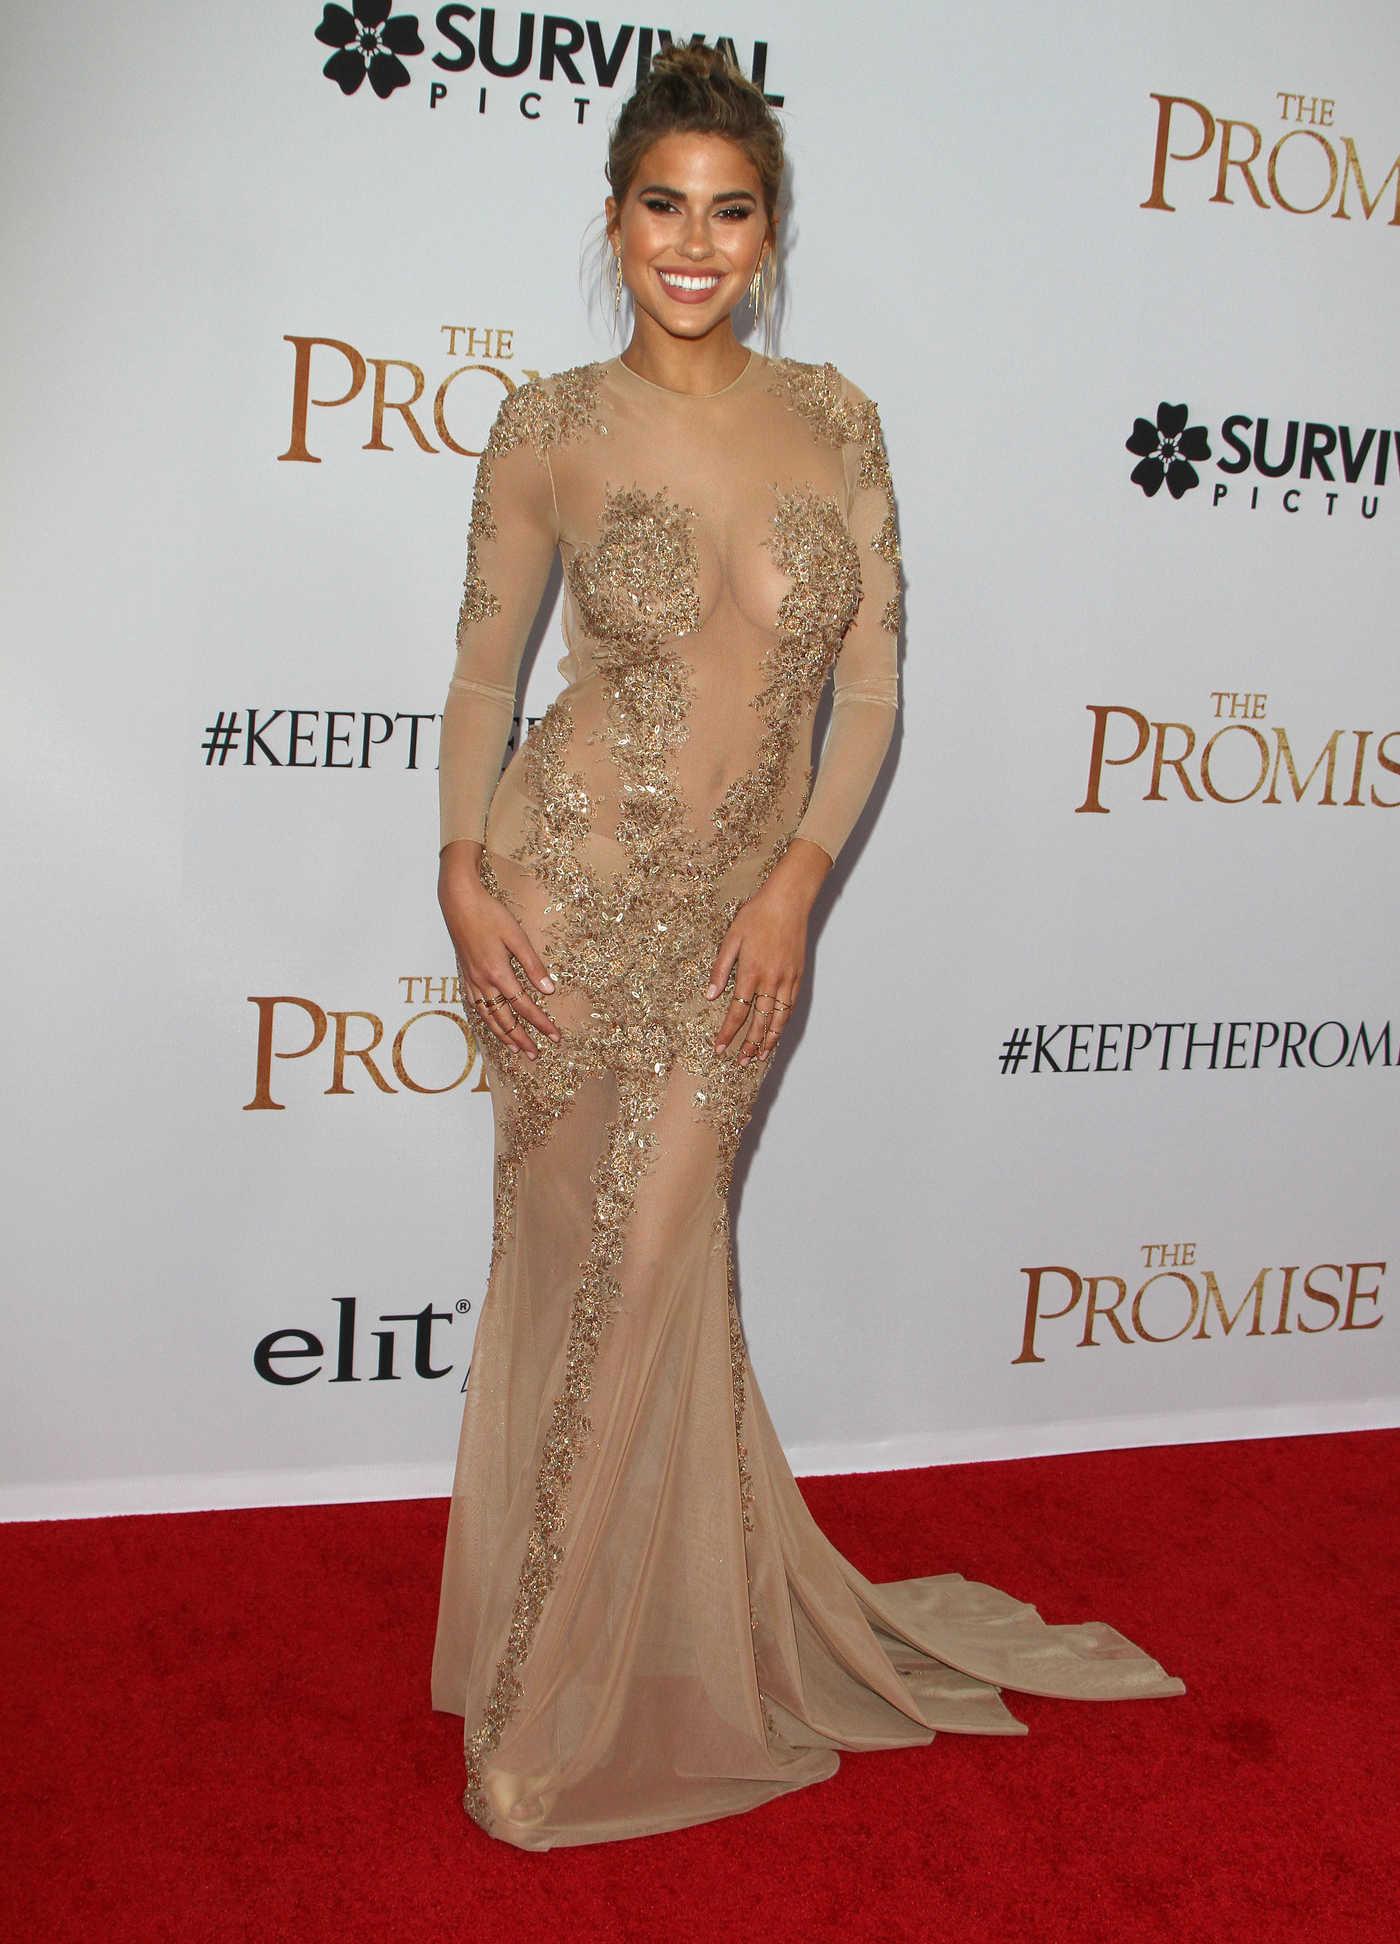 Kara Del Toro at The Promise Premiere in Los Angeles 04/12/2017